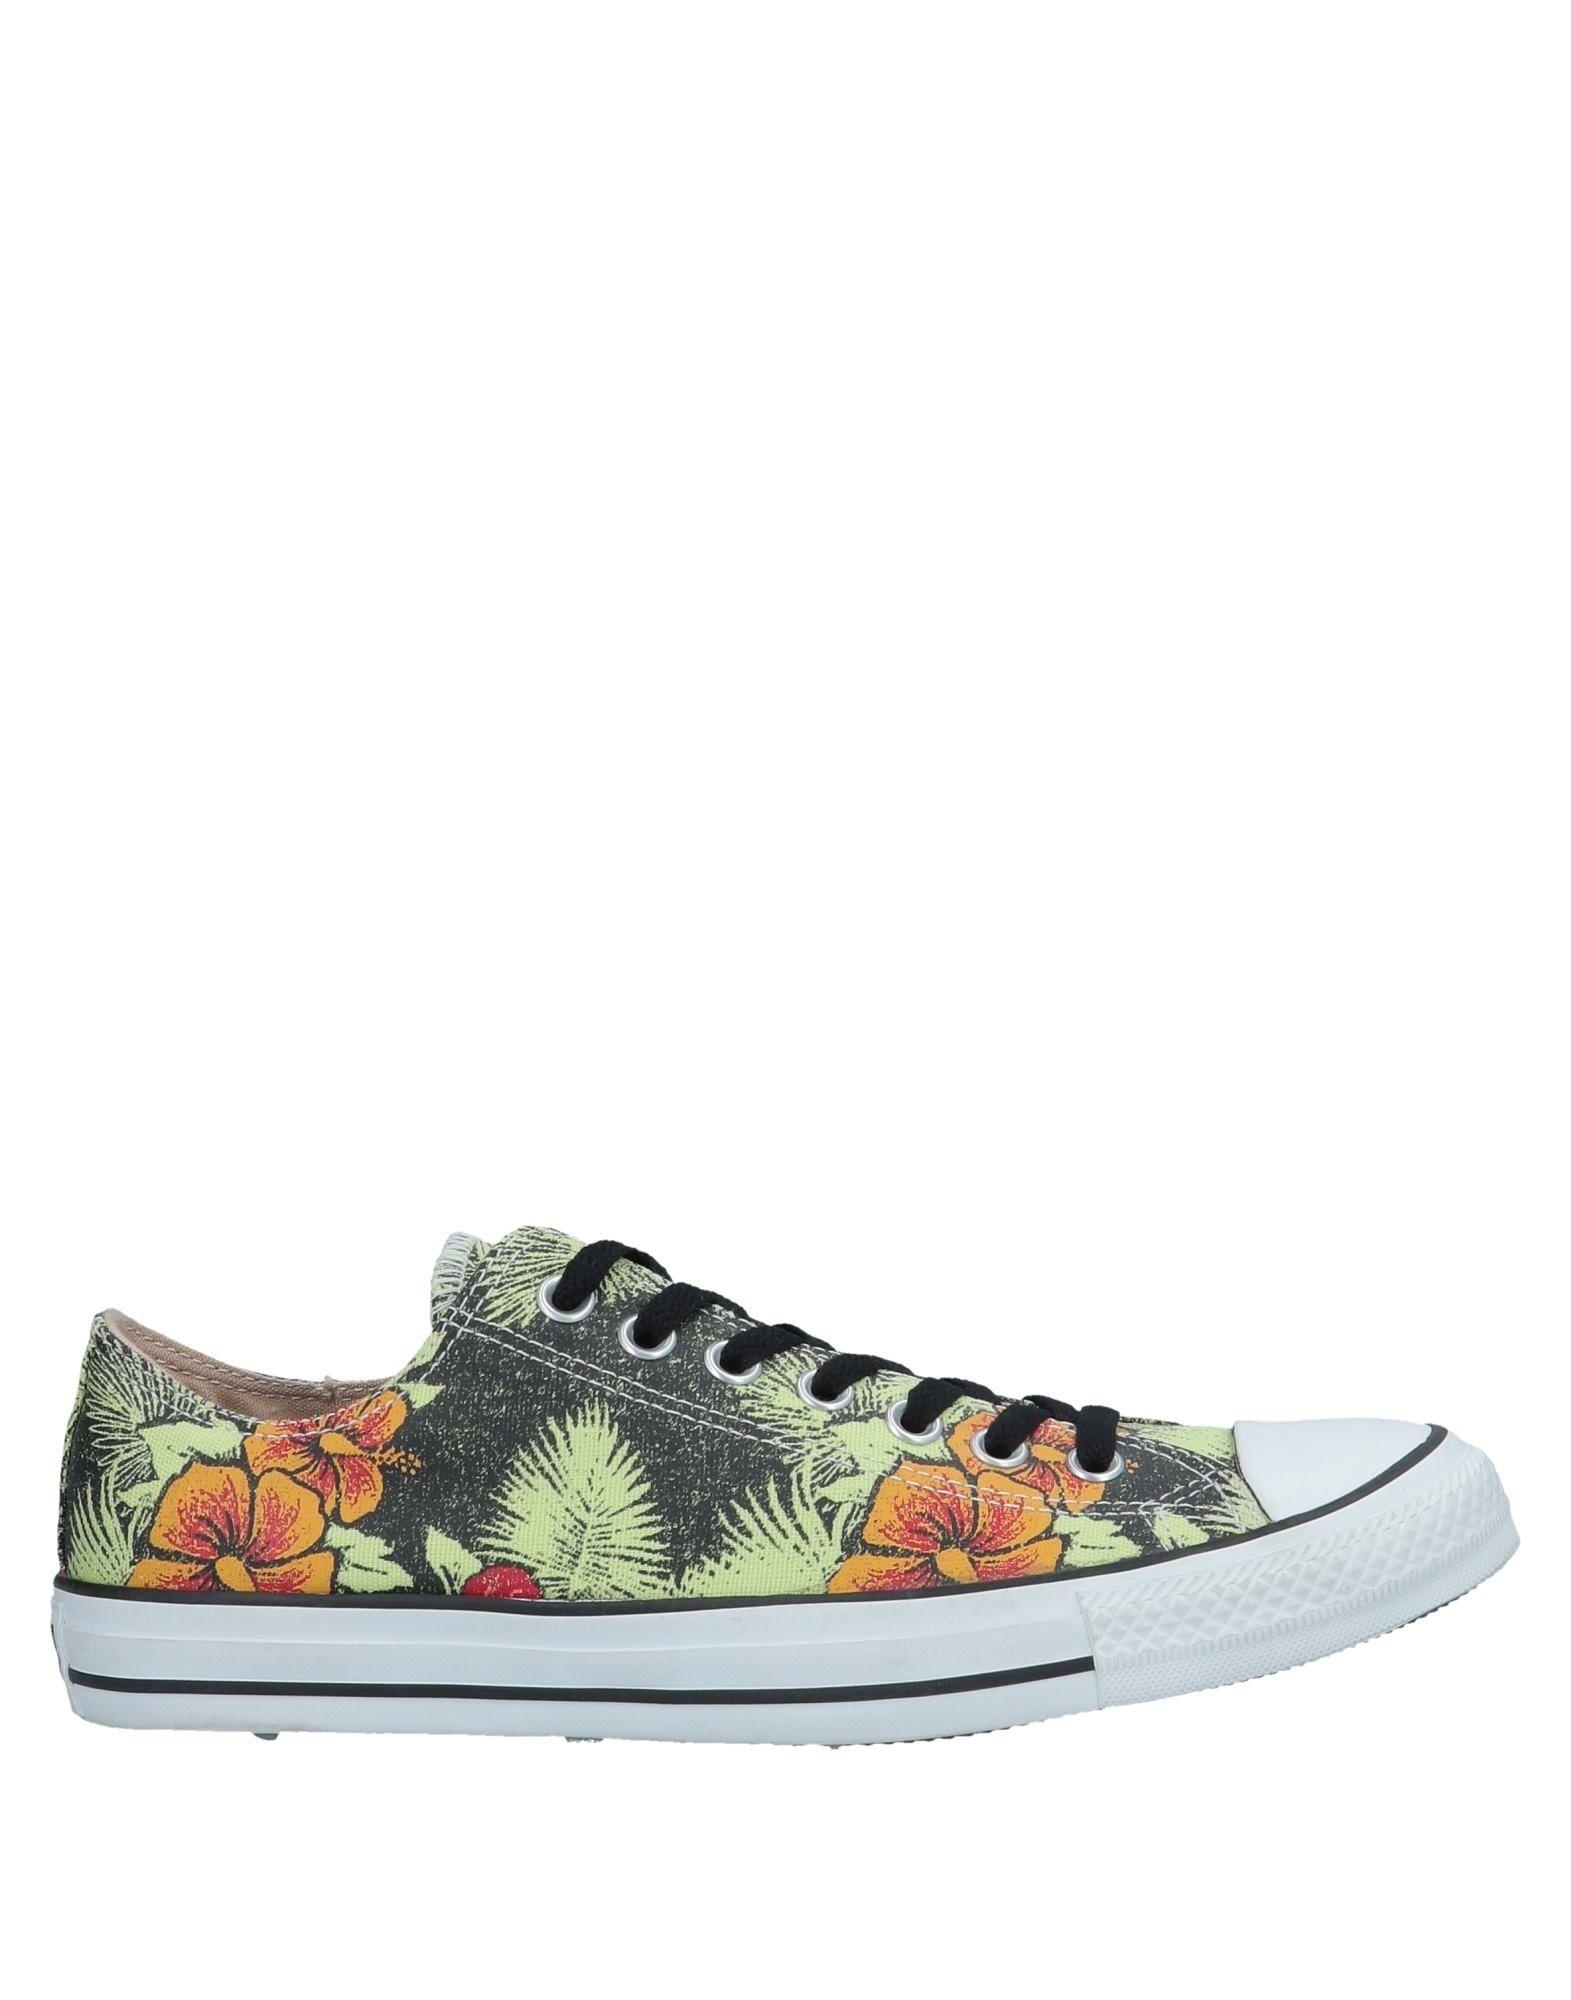 Converse All Star Sneakers - Men Converse All Star Sneakers Kingdom online on  United Kingdom Sneakers - 11581302RK 8f6127